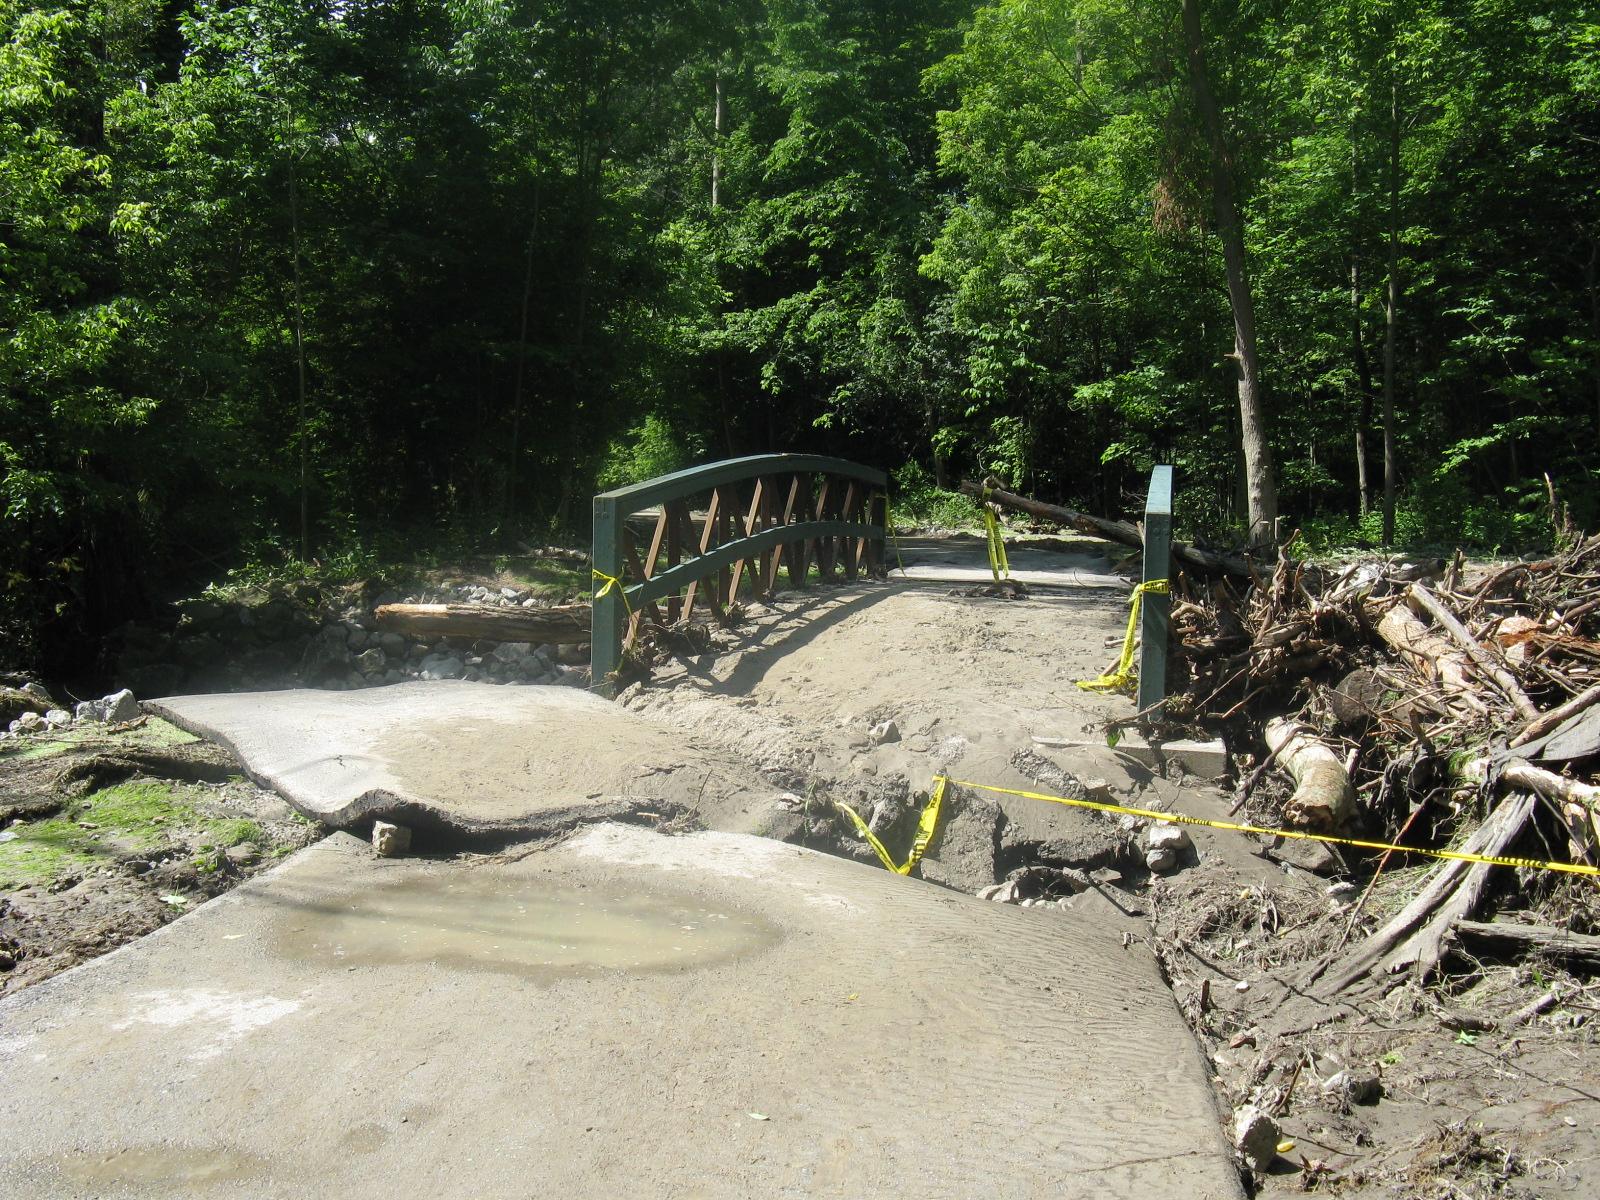 Post 2005 storm damage